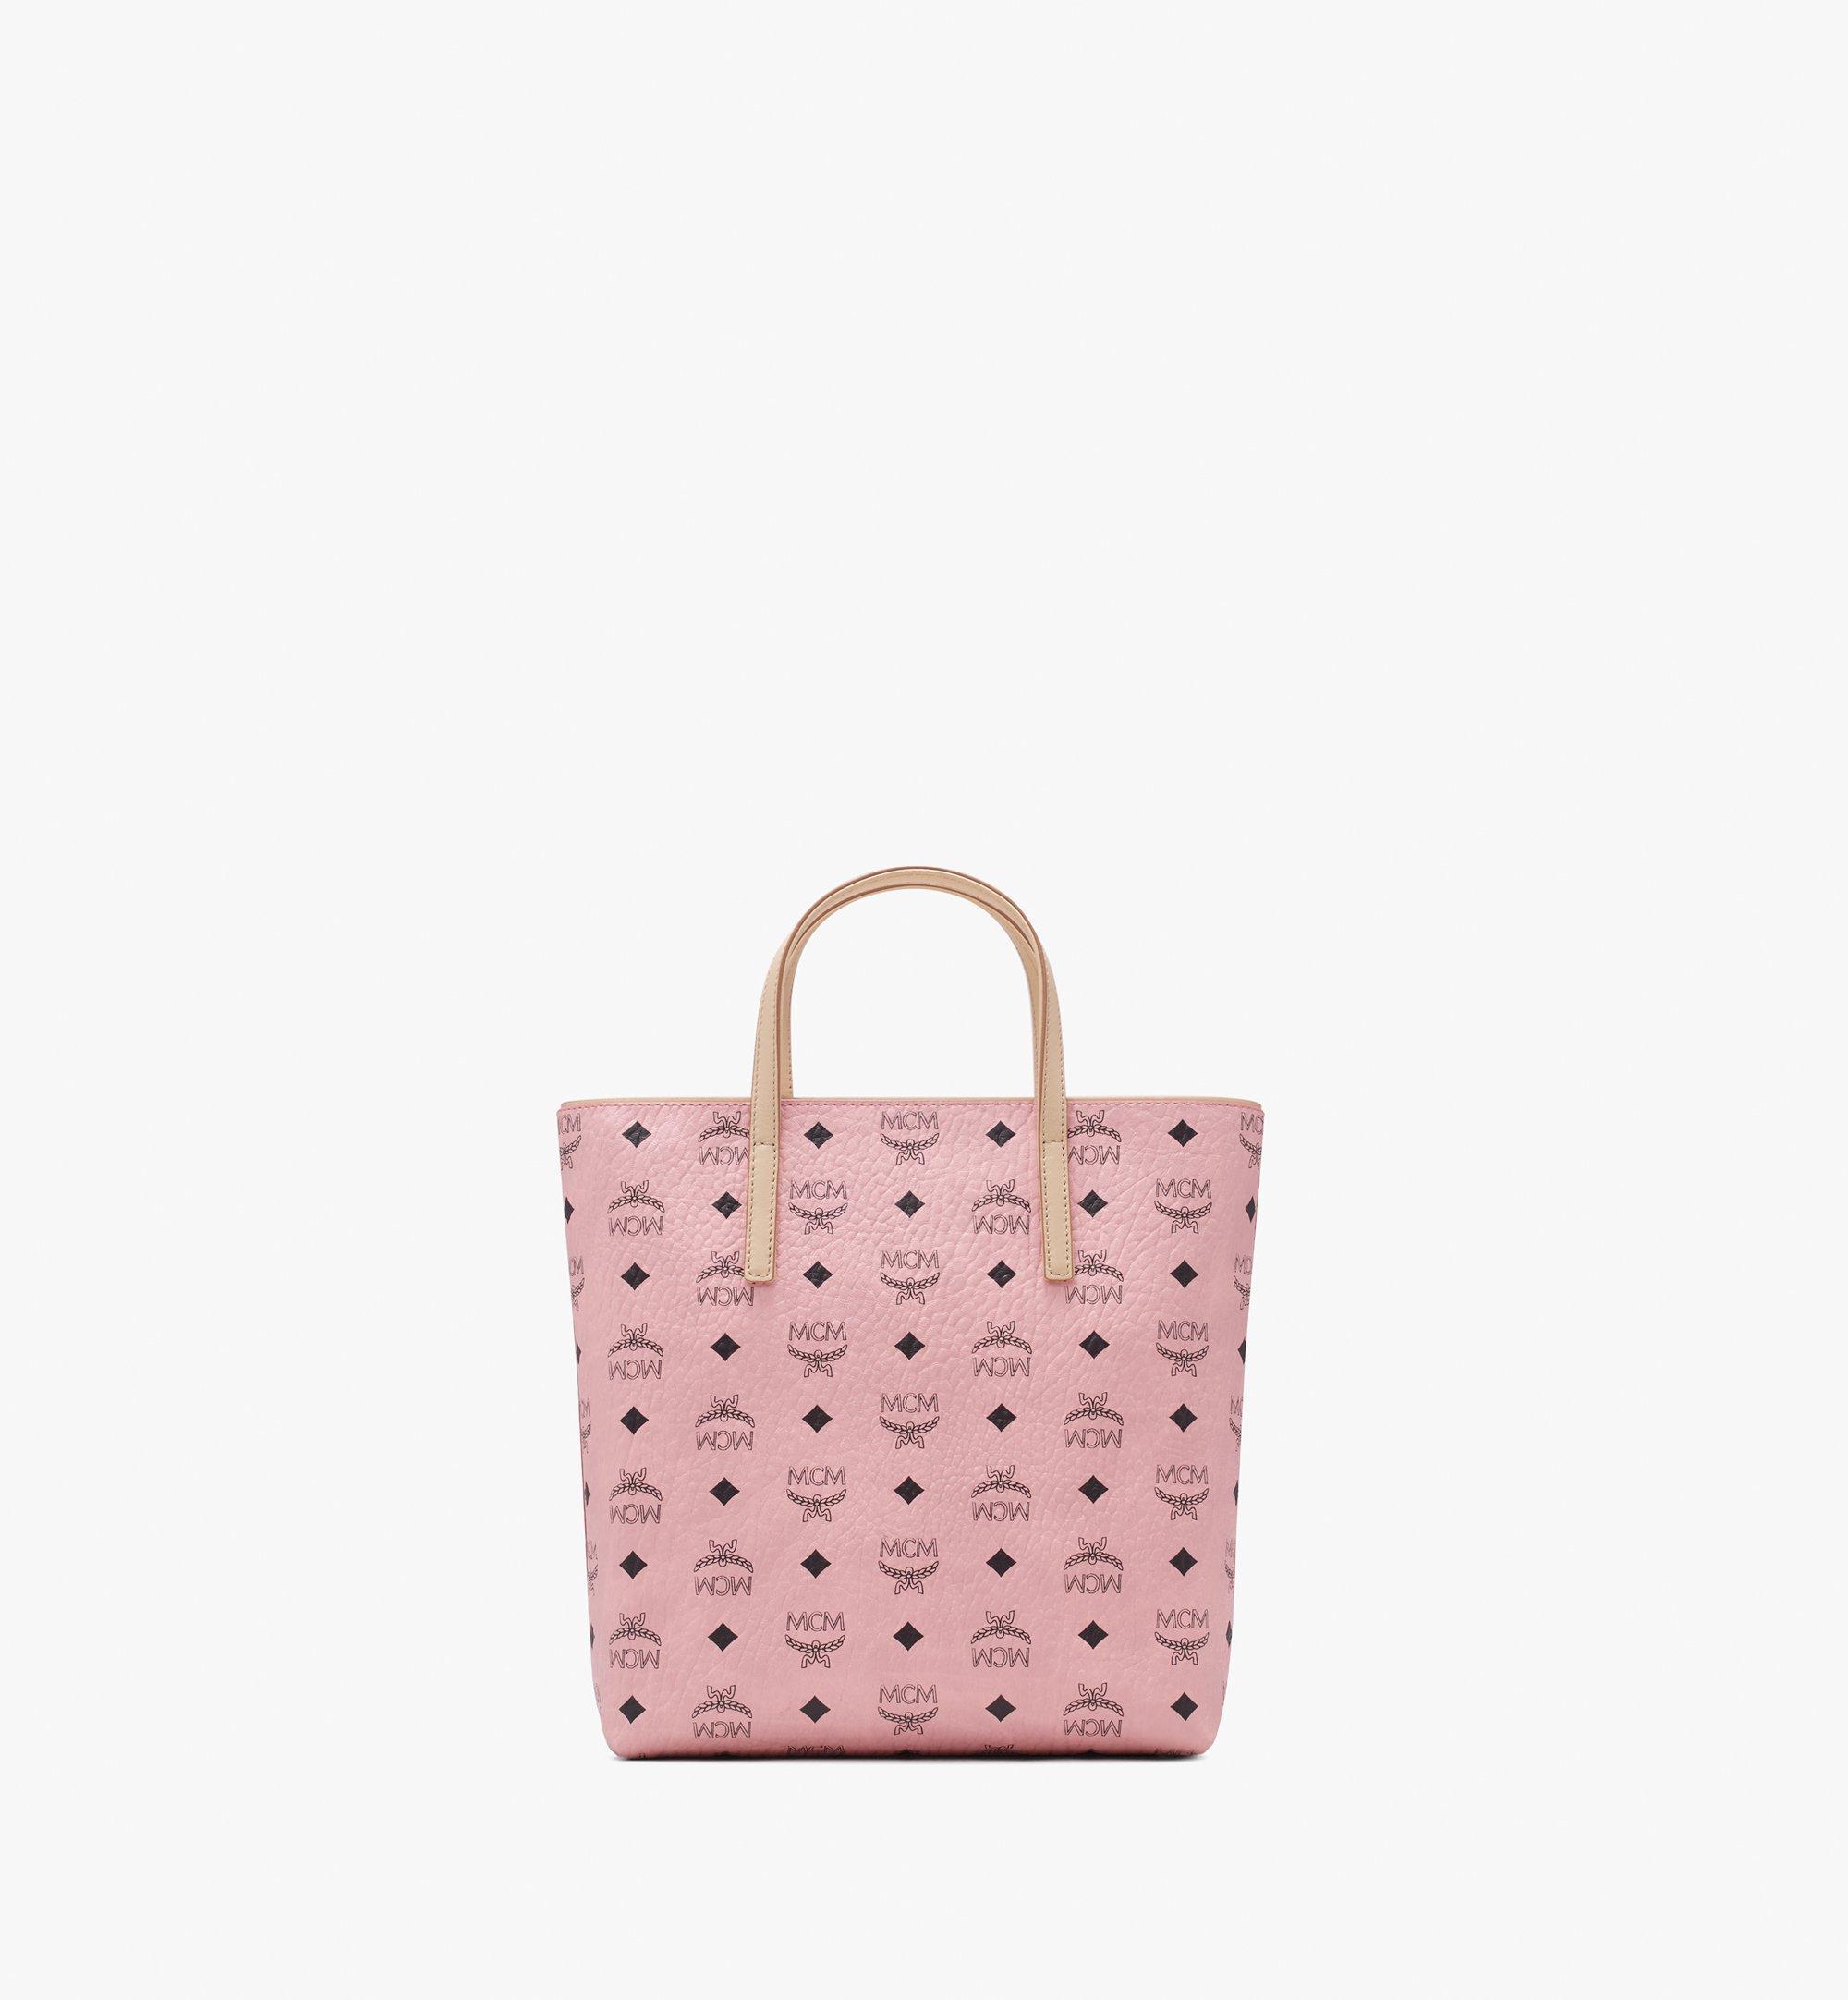 Small Anya Shopper in Visetos Soft Pink   MCM® DE